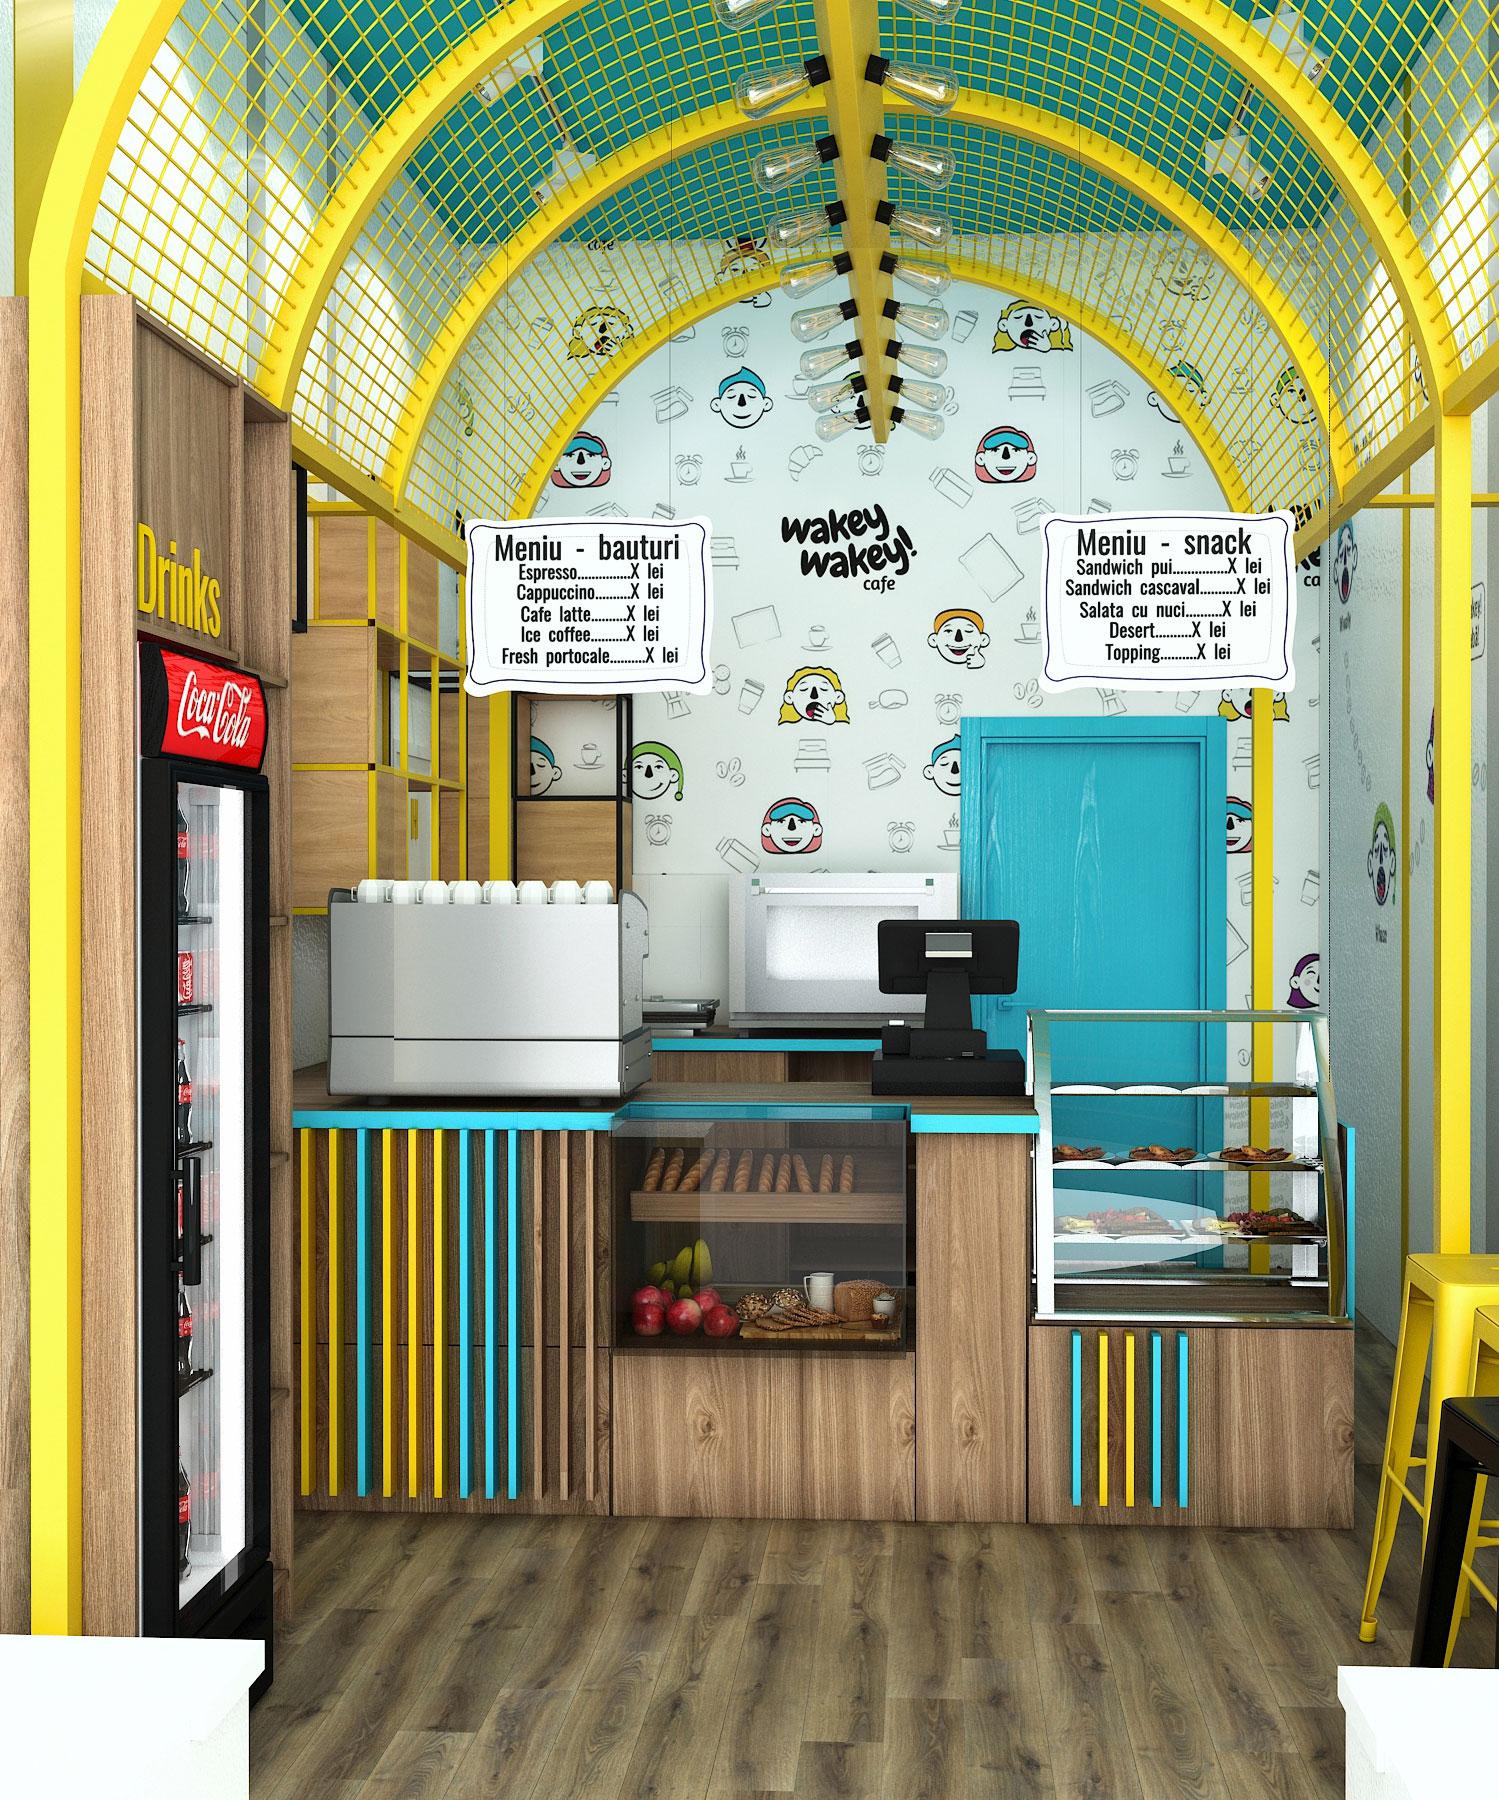 design interior coffee shop Wakey Wakey